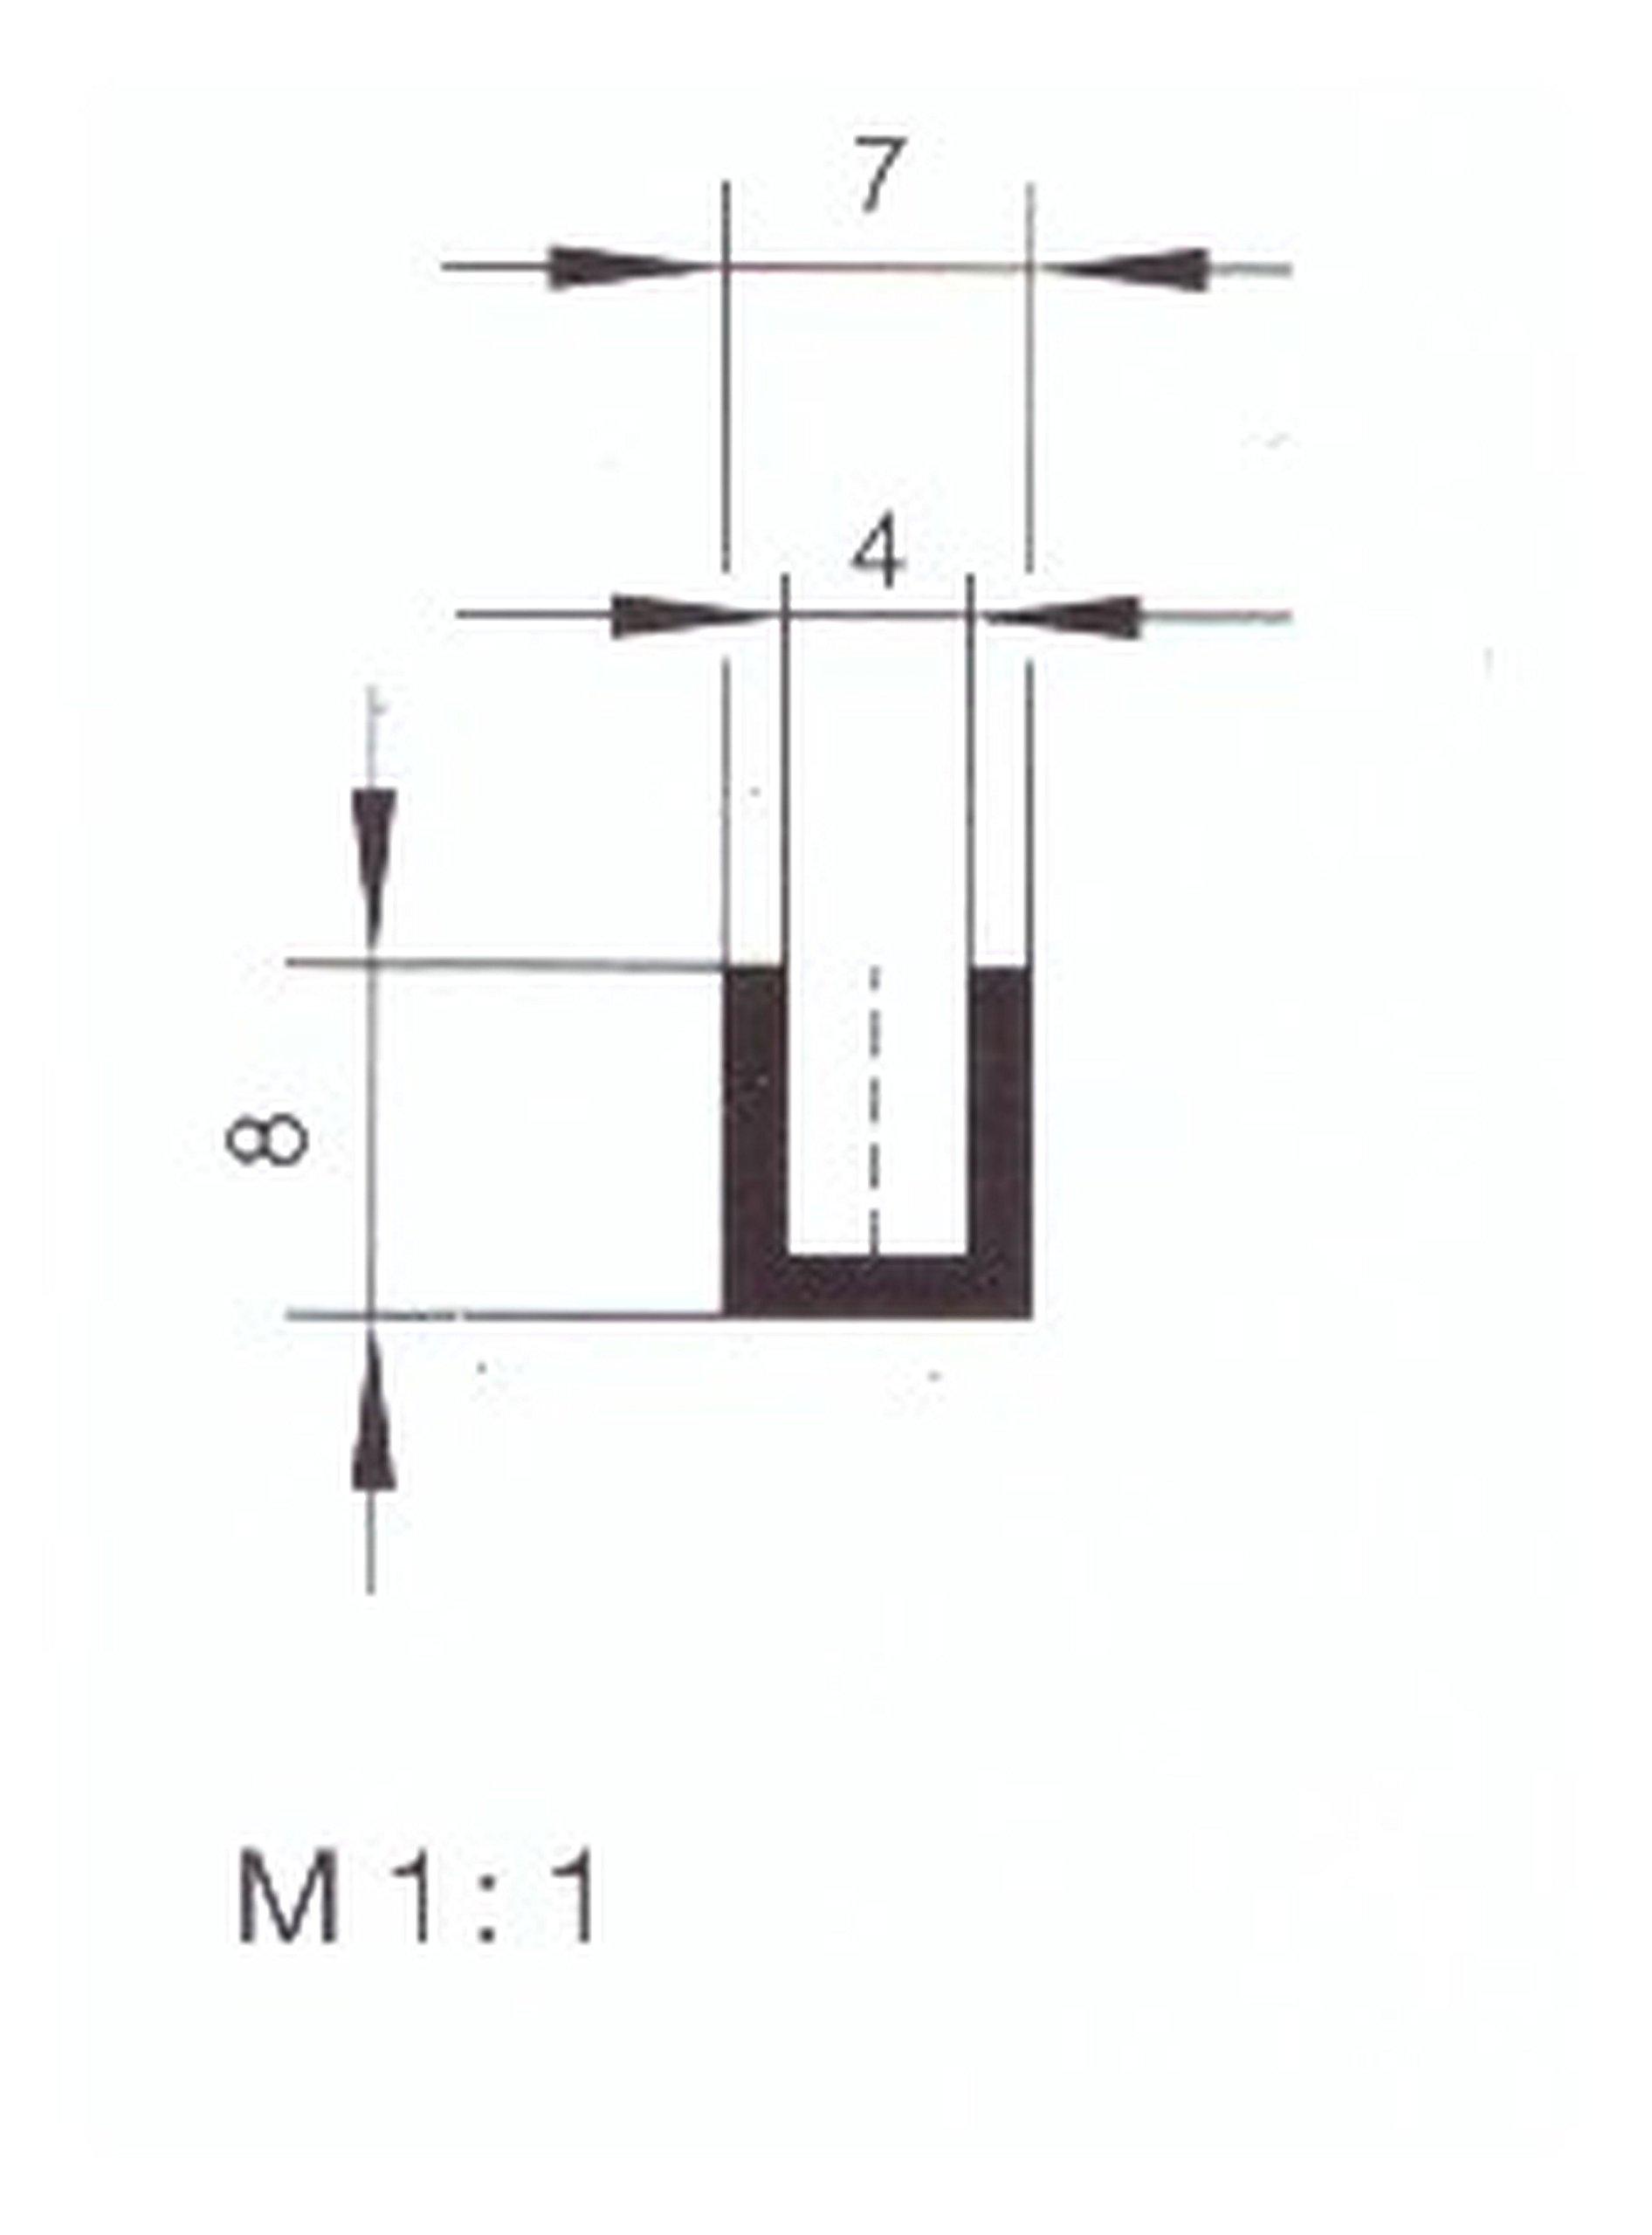 Eutras Edge Safety 1941Frame FP3006Edge Protection Rubber Seal Split 4.0mm, black, 3m